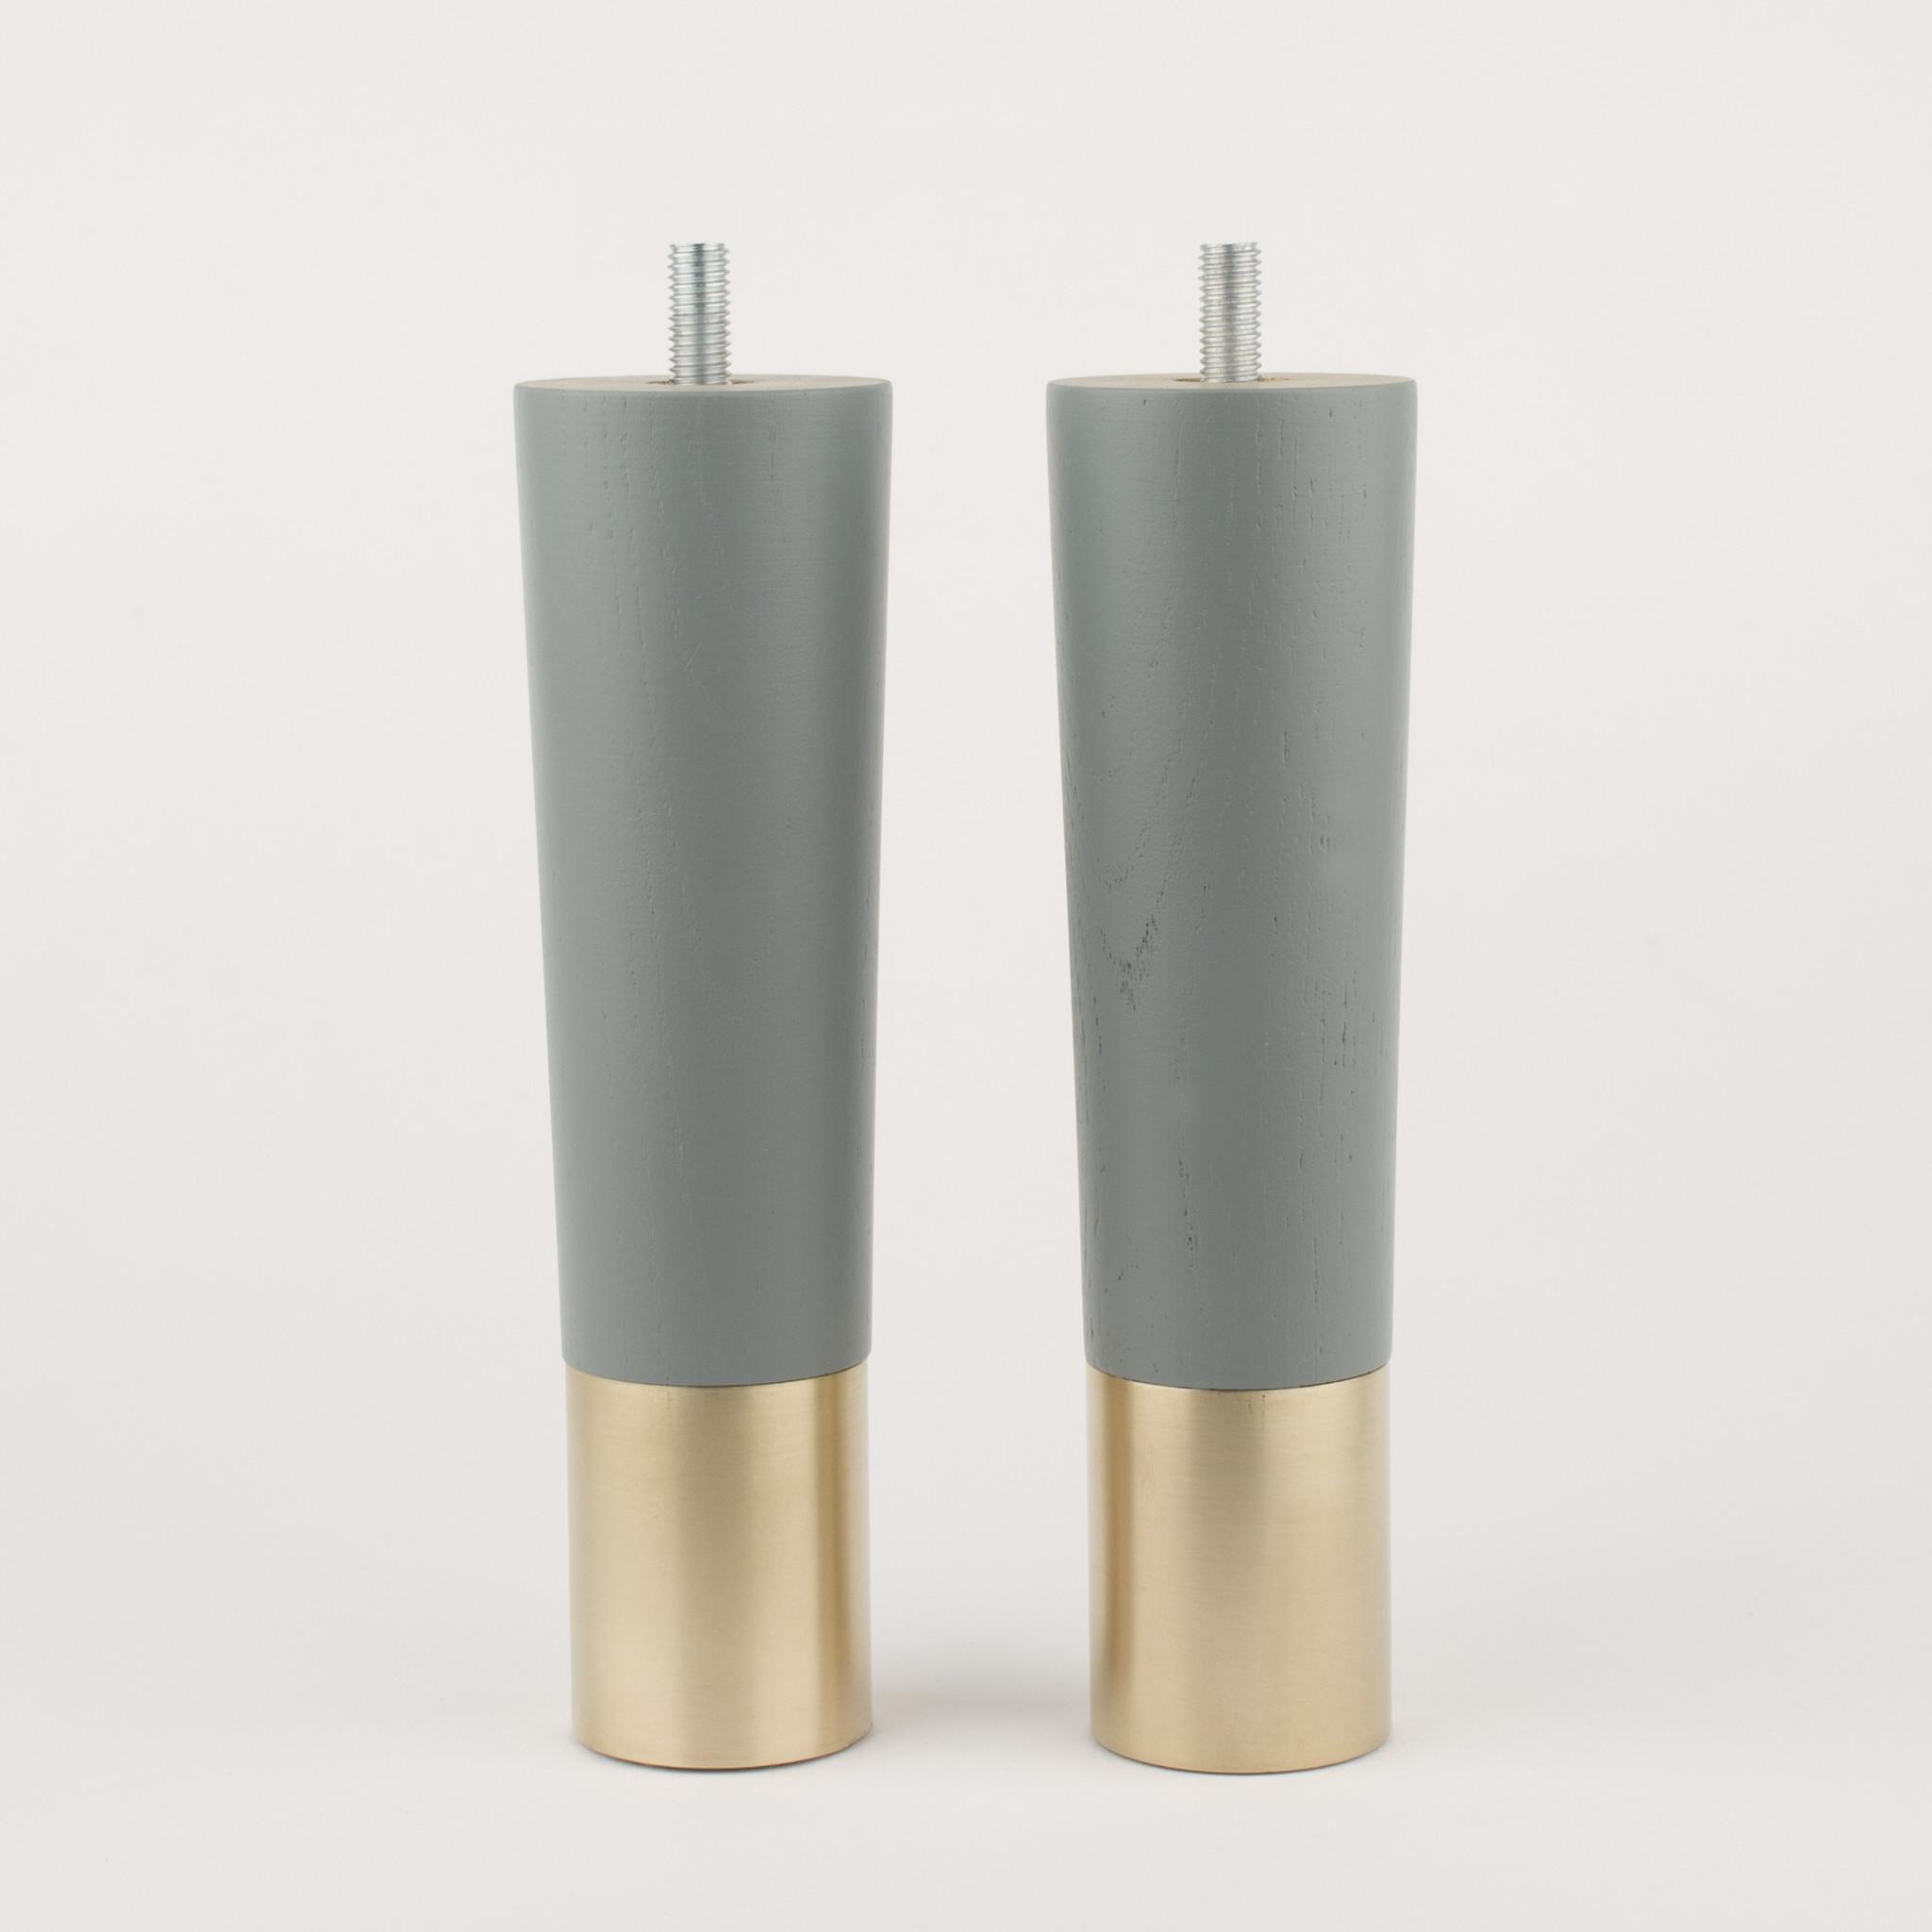 Estelle 170 ben 4-pack grey Prettypegs